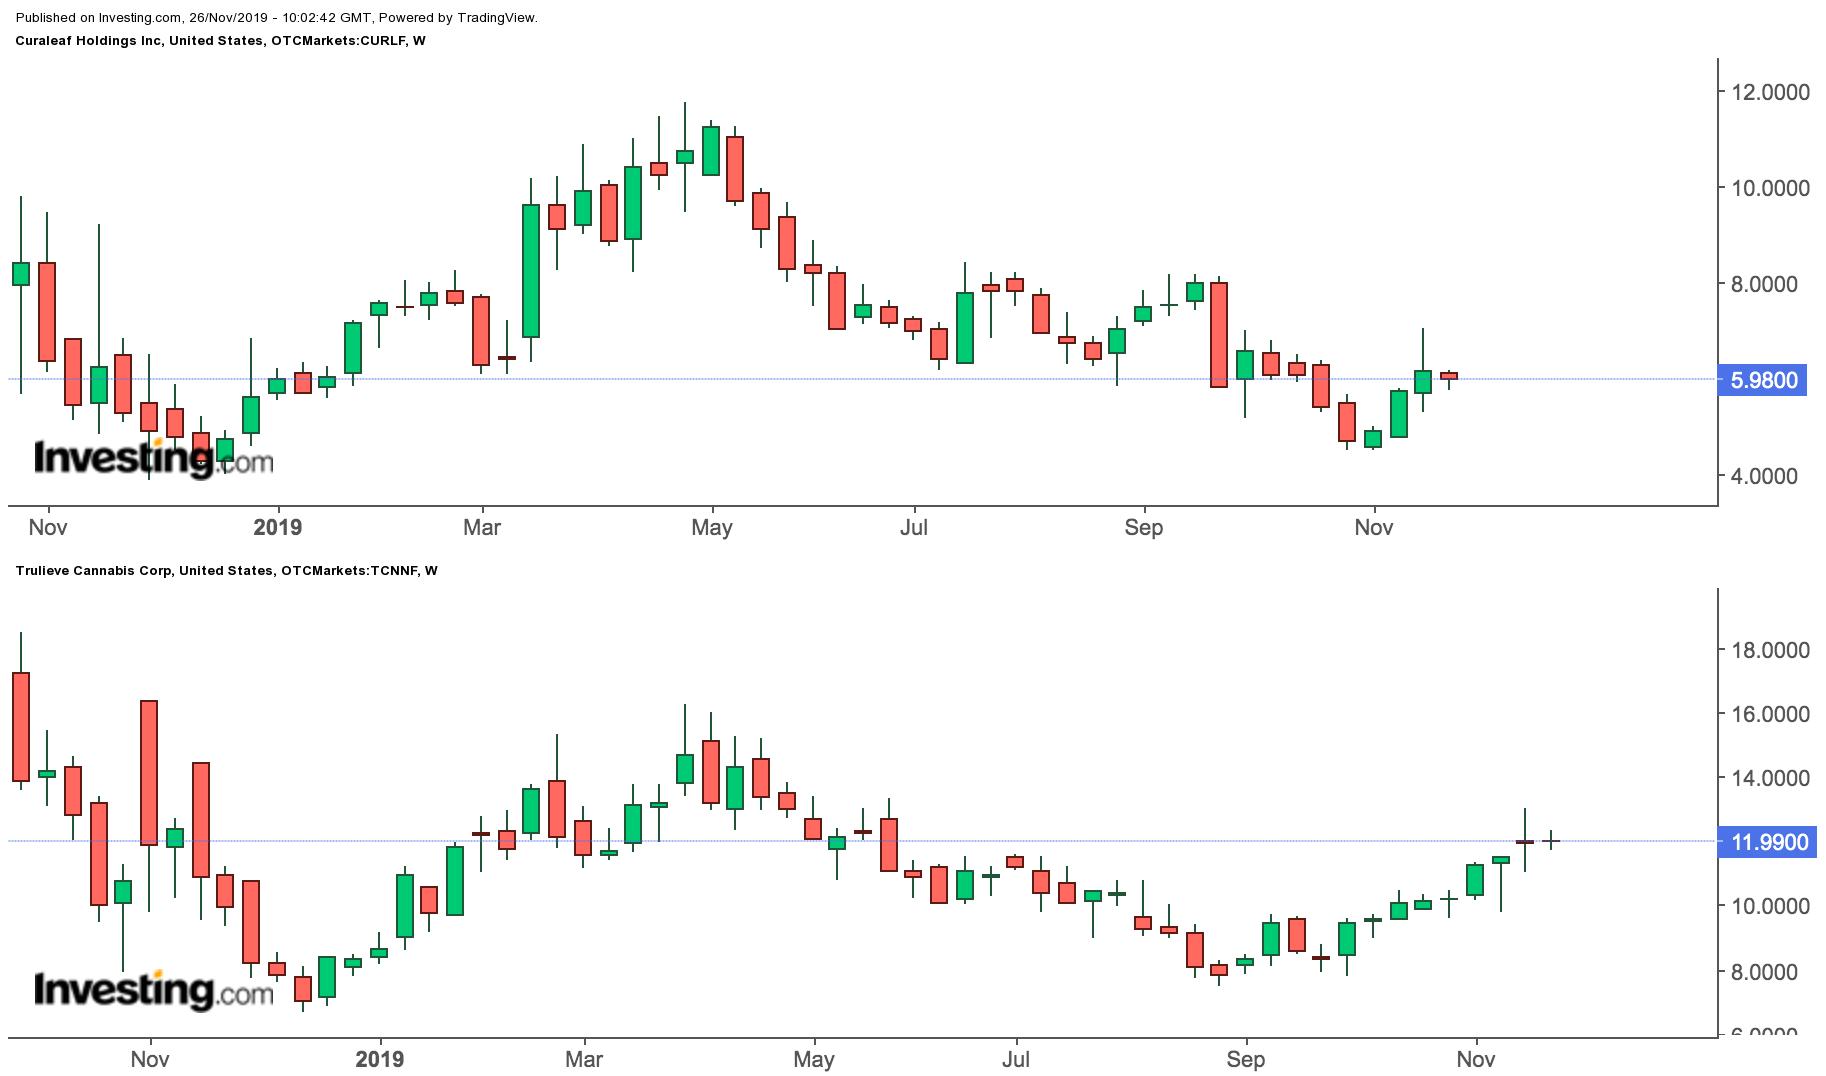 Trulieve, Curaleaf Weekly Price Charts